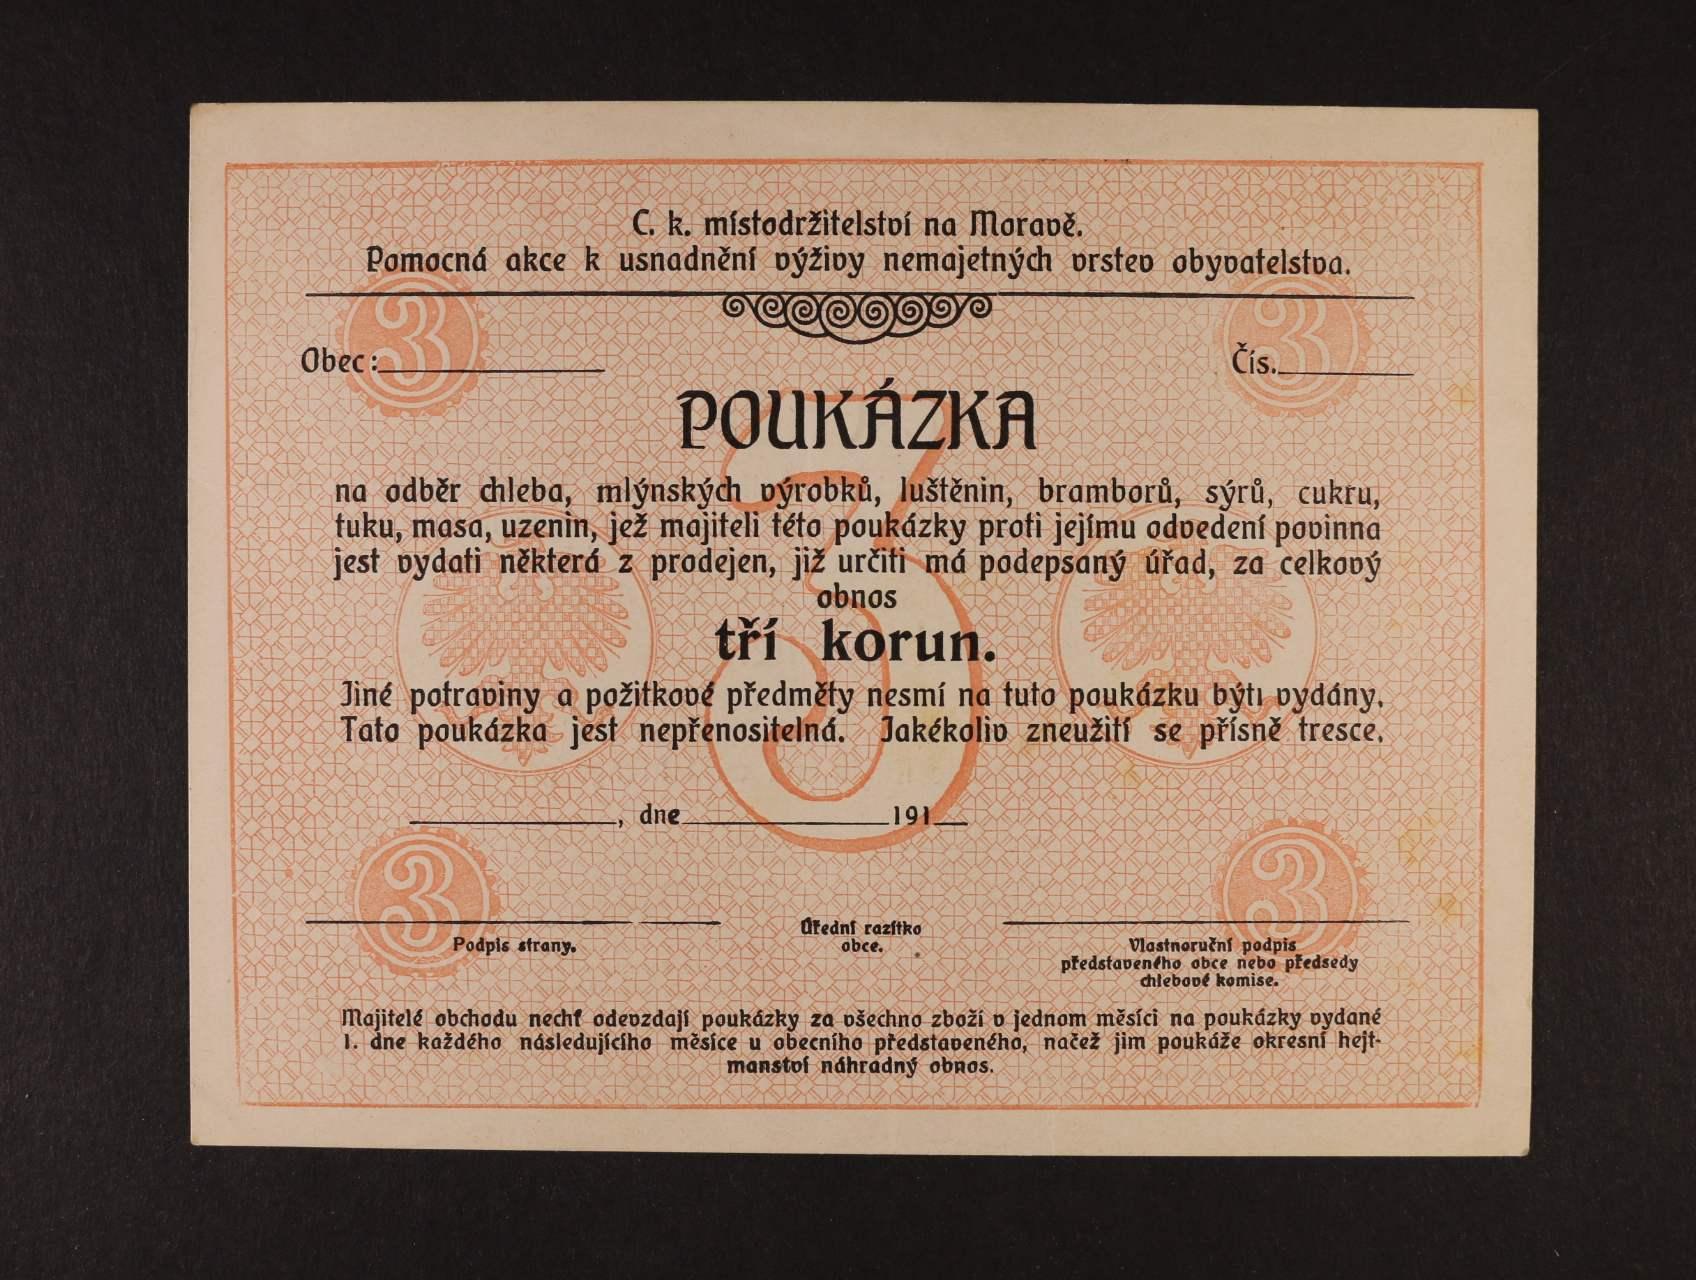 Morava (Mähren), 3 K K.k. Statthalterei in Mähren, formulář, D.H. 129.1.4a